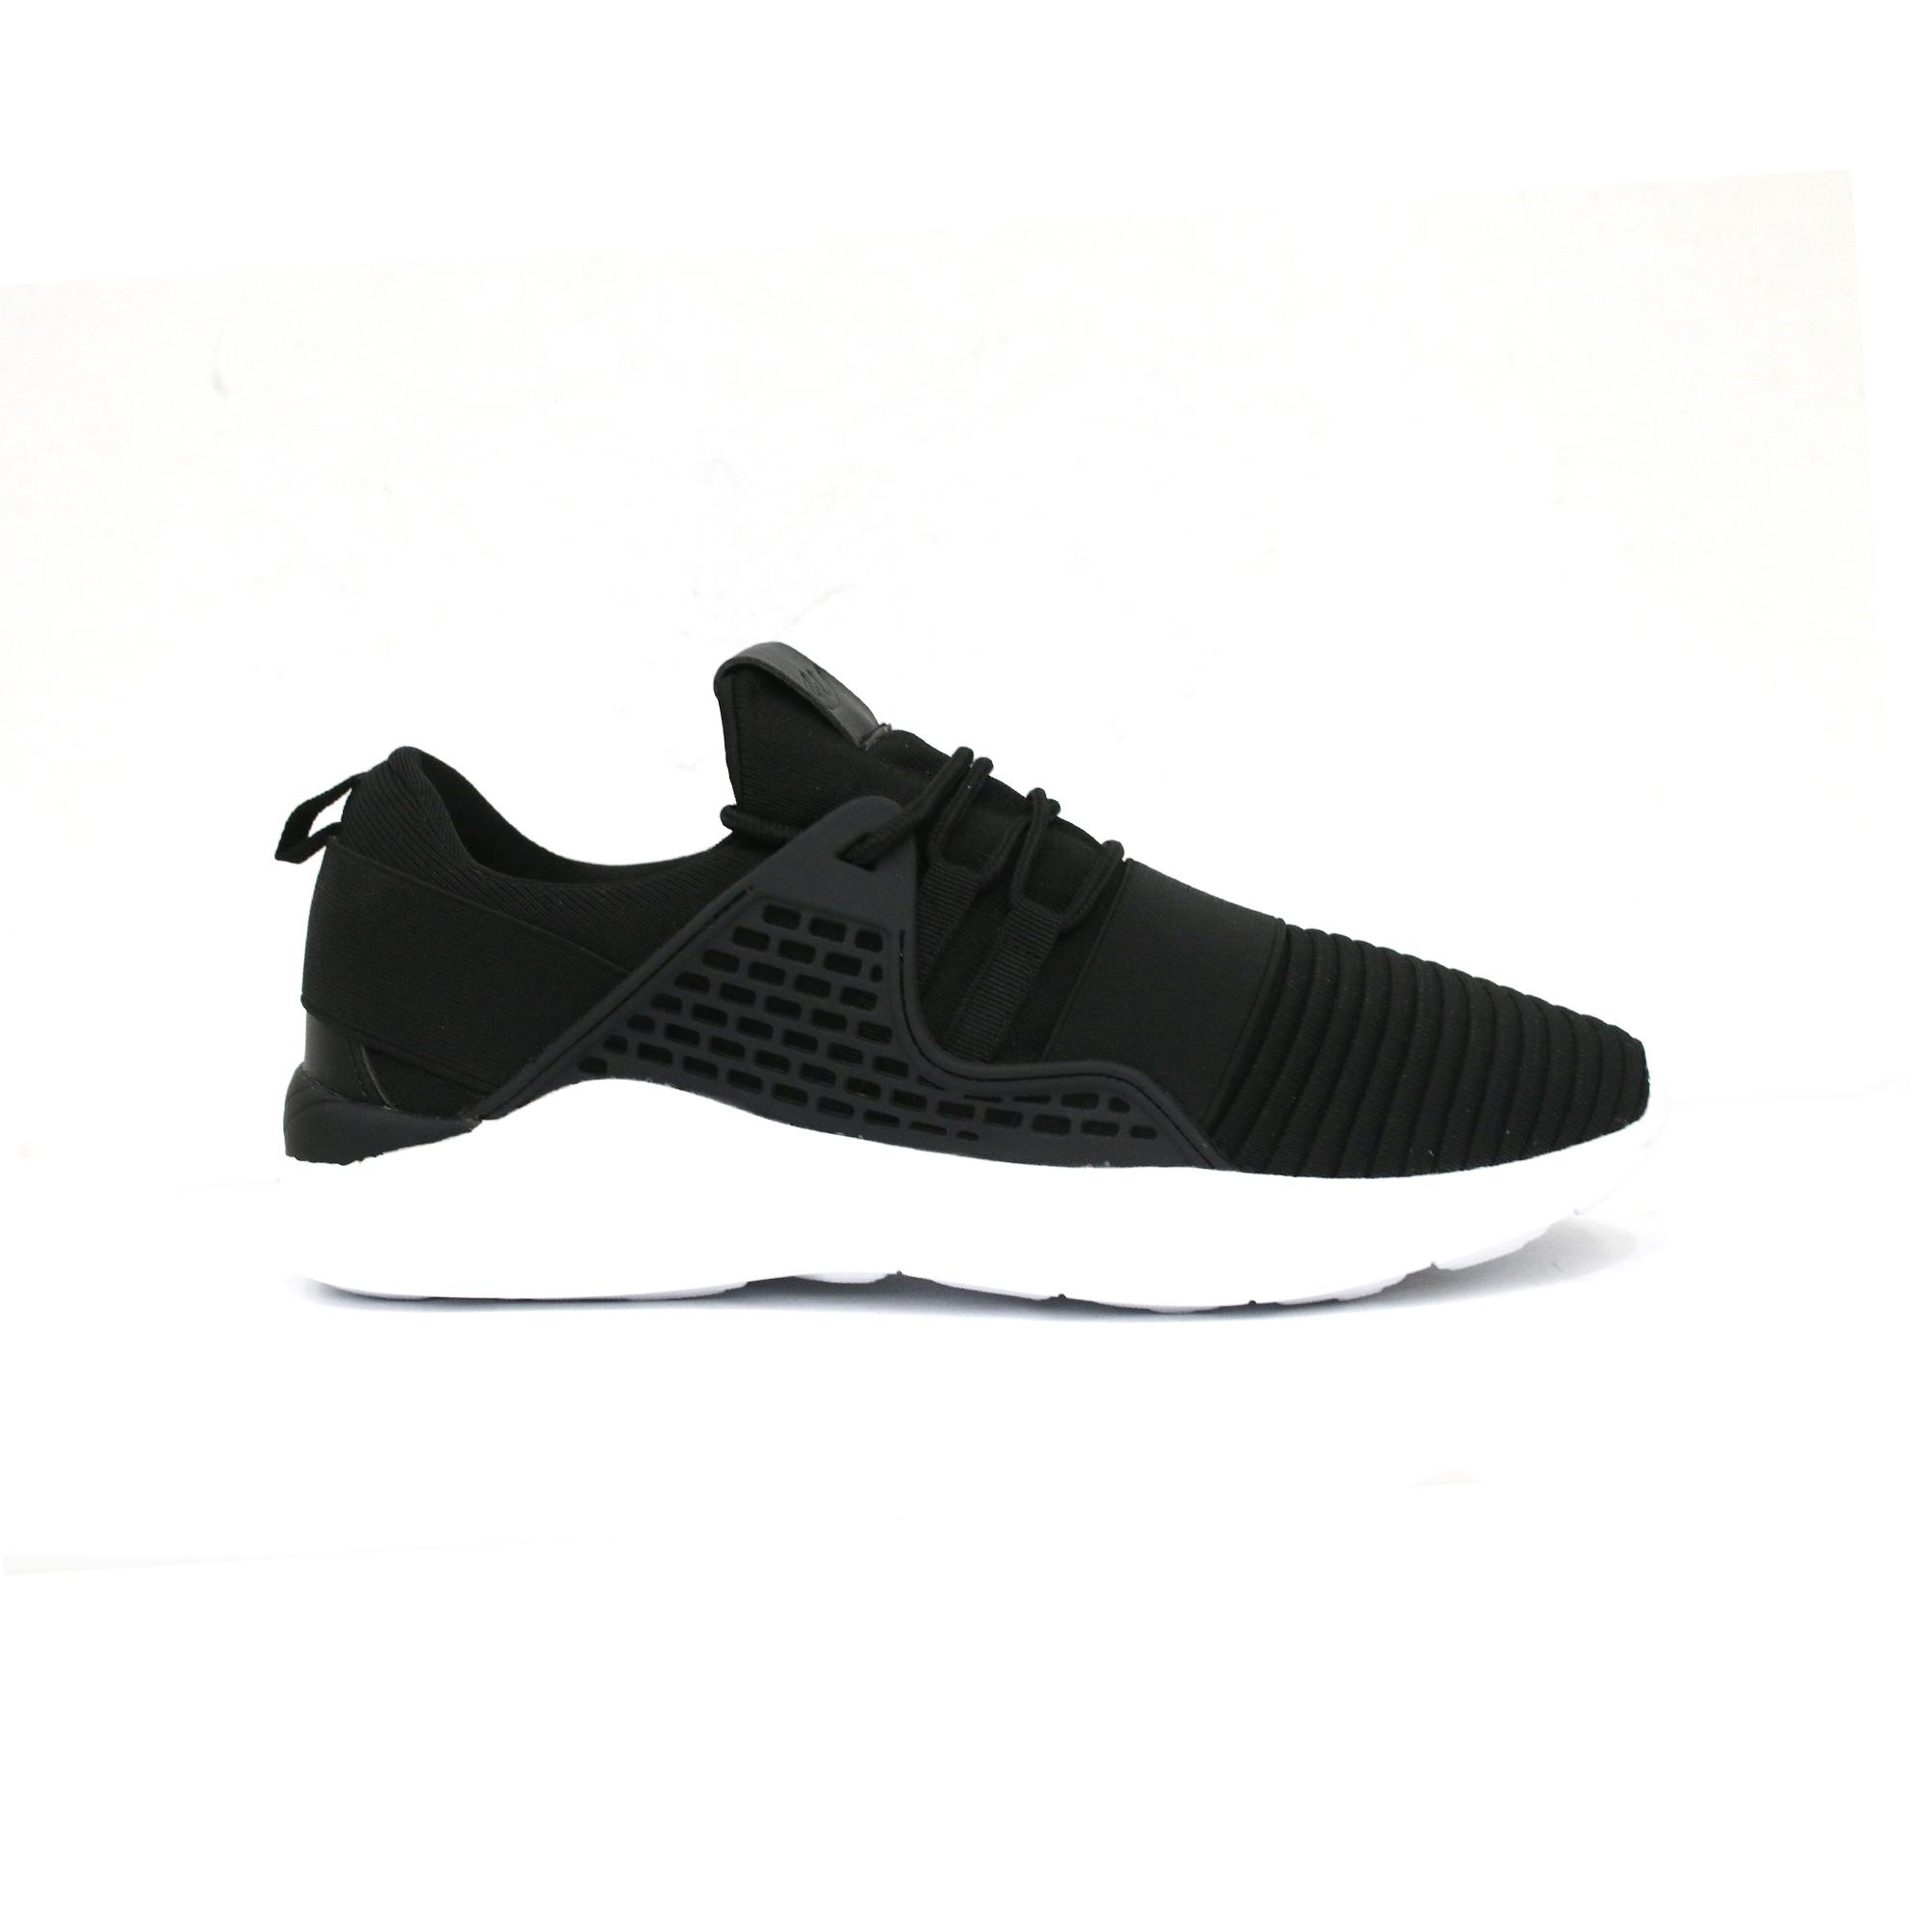 9ec98daf1a14 Womens Training Shoes for sale - Cross Training Shoes for Women ...